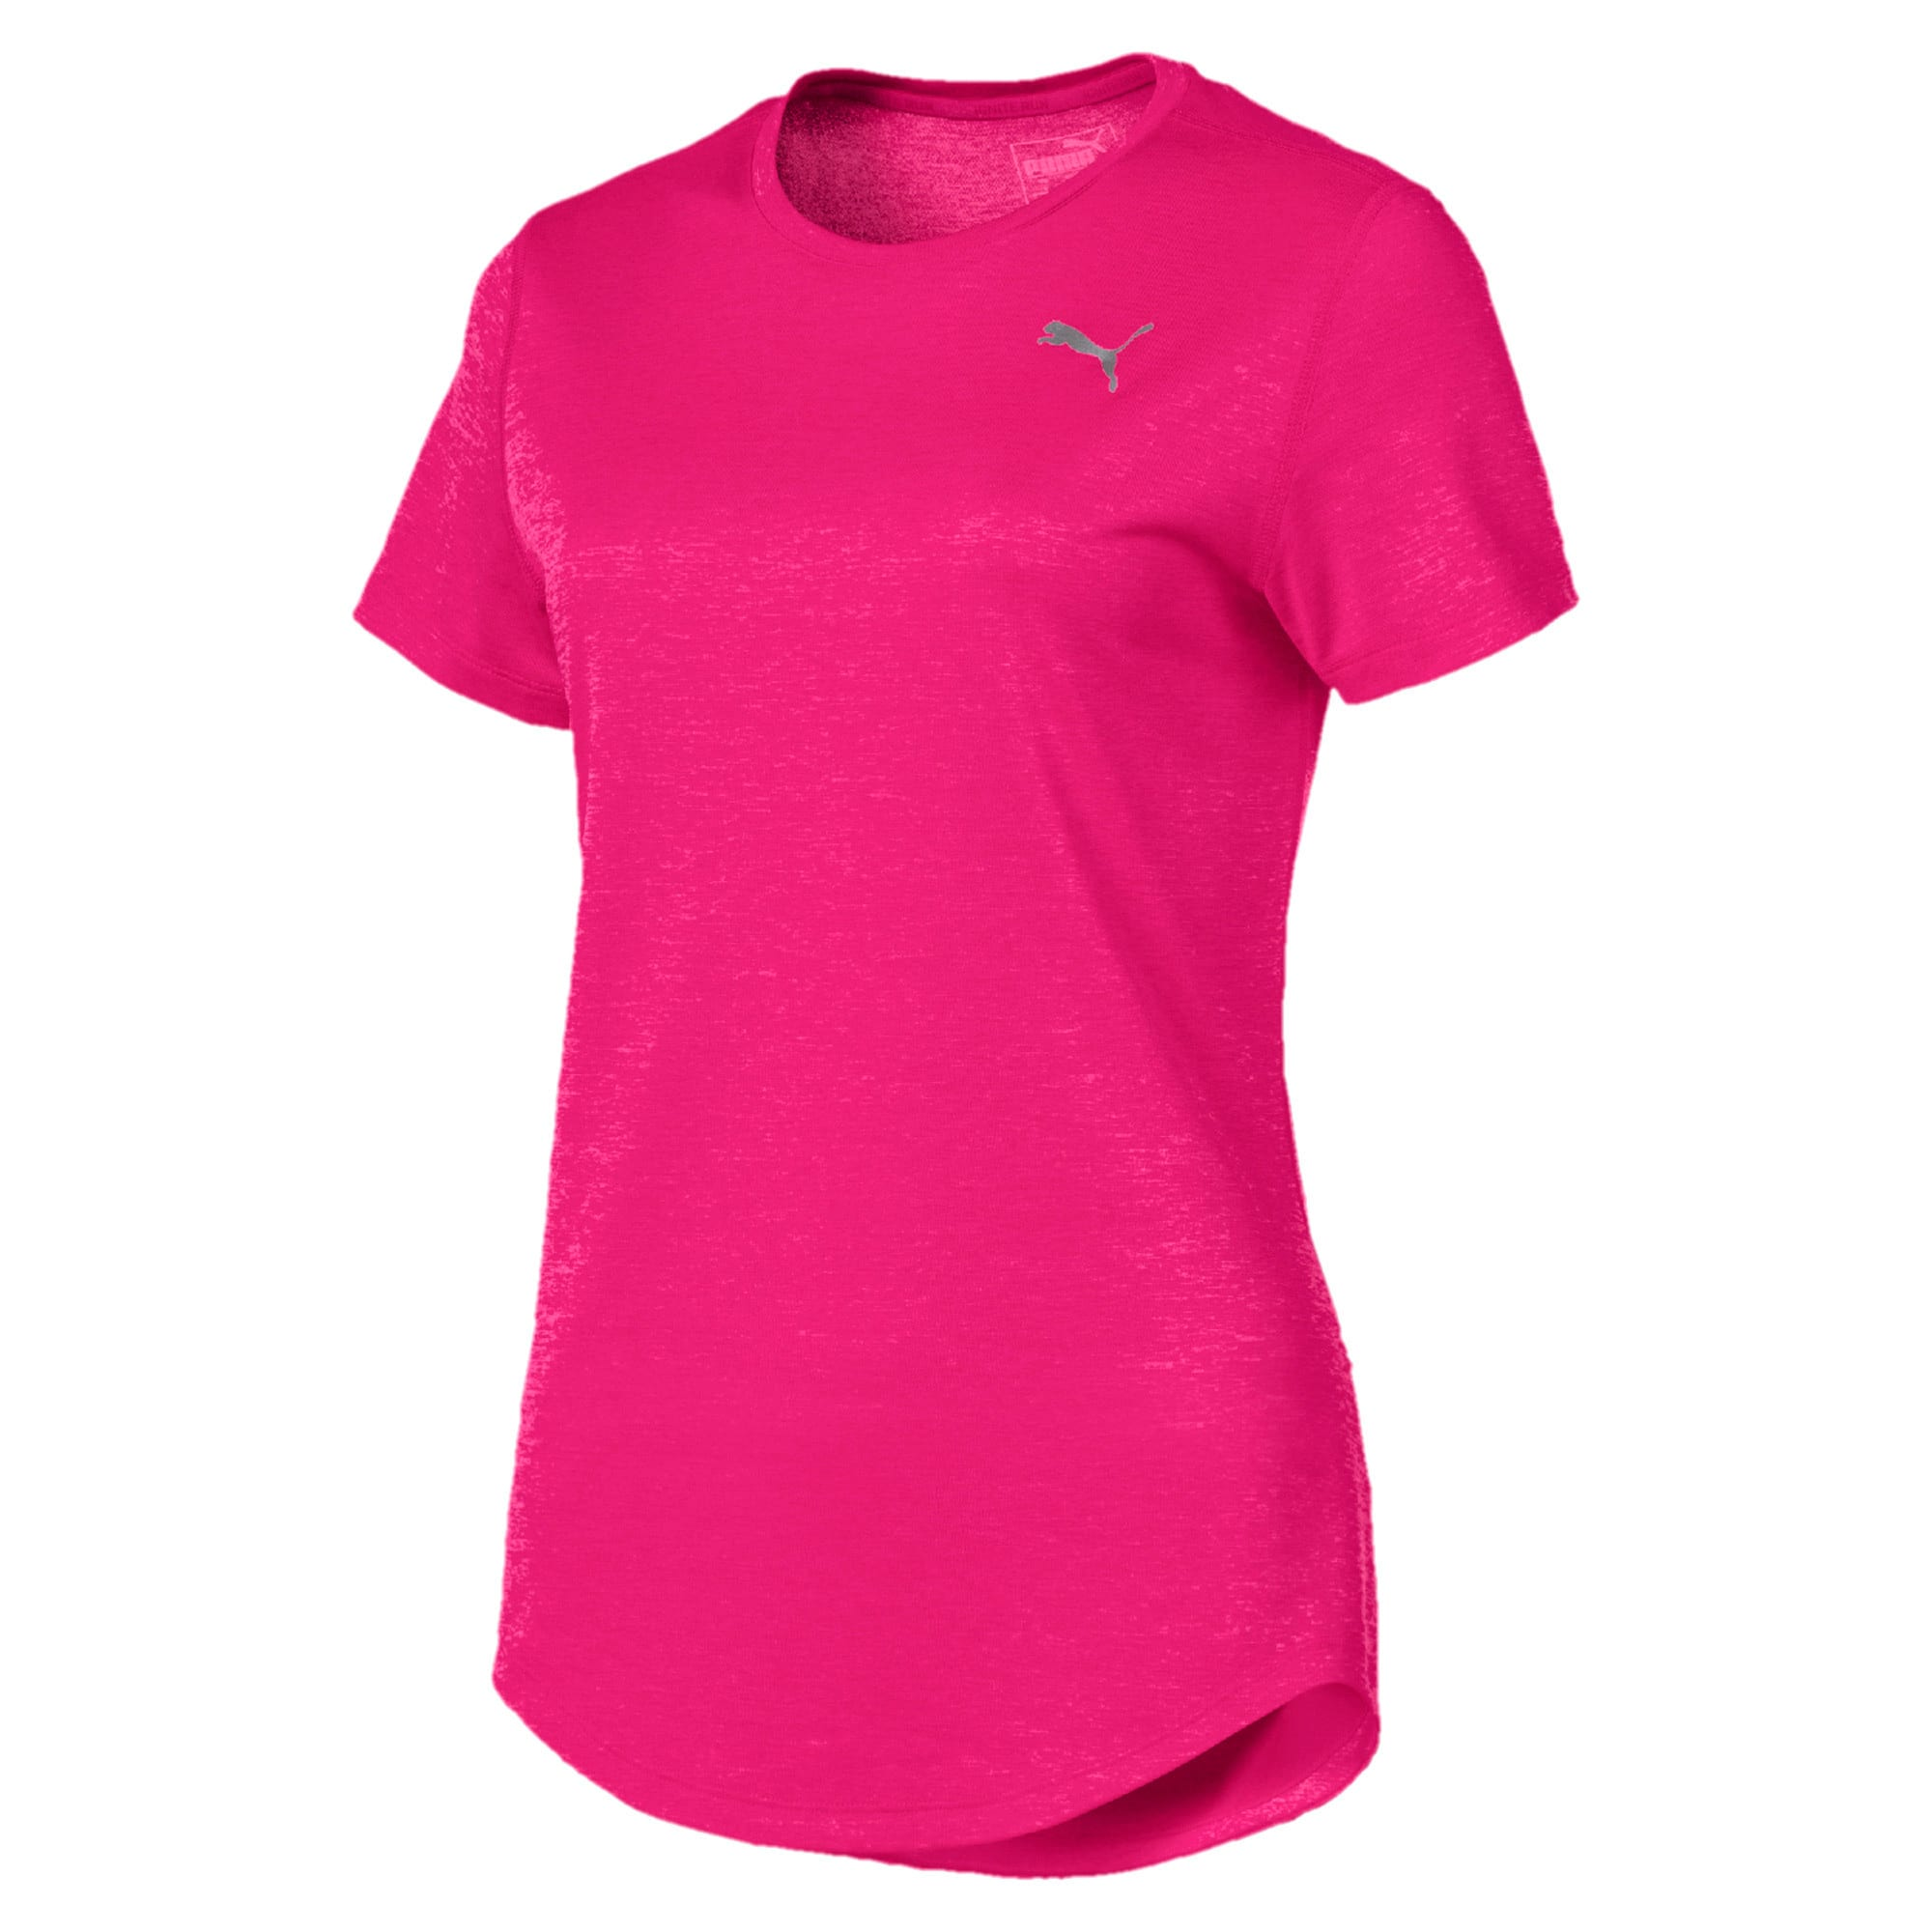 Thumbnail 4 of T-Shirt Epic Heather Running pour femme, Fuchsia Purple Heather, medium